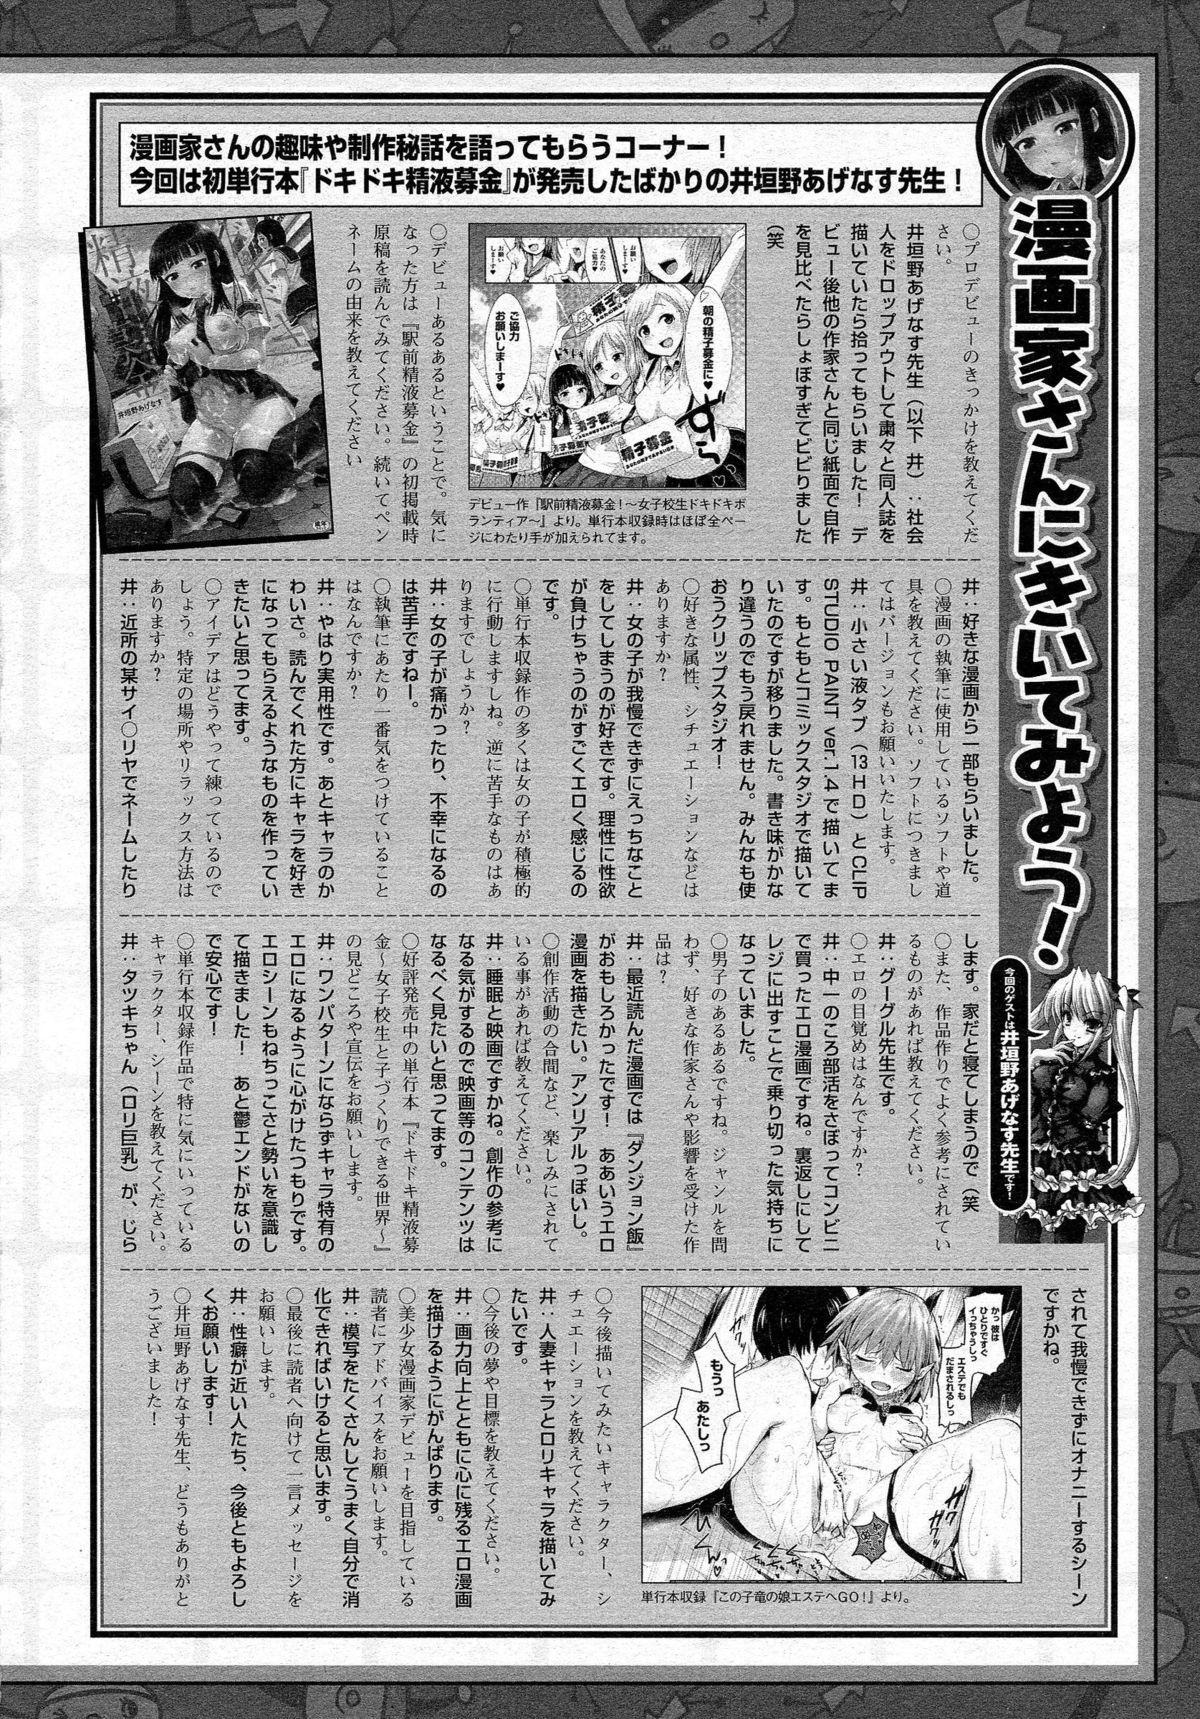 COMIC Unreal 2015-06 Vol. 55 + Hisasi Illust Shuu 449